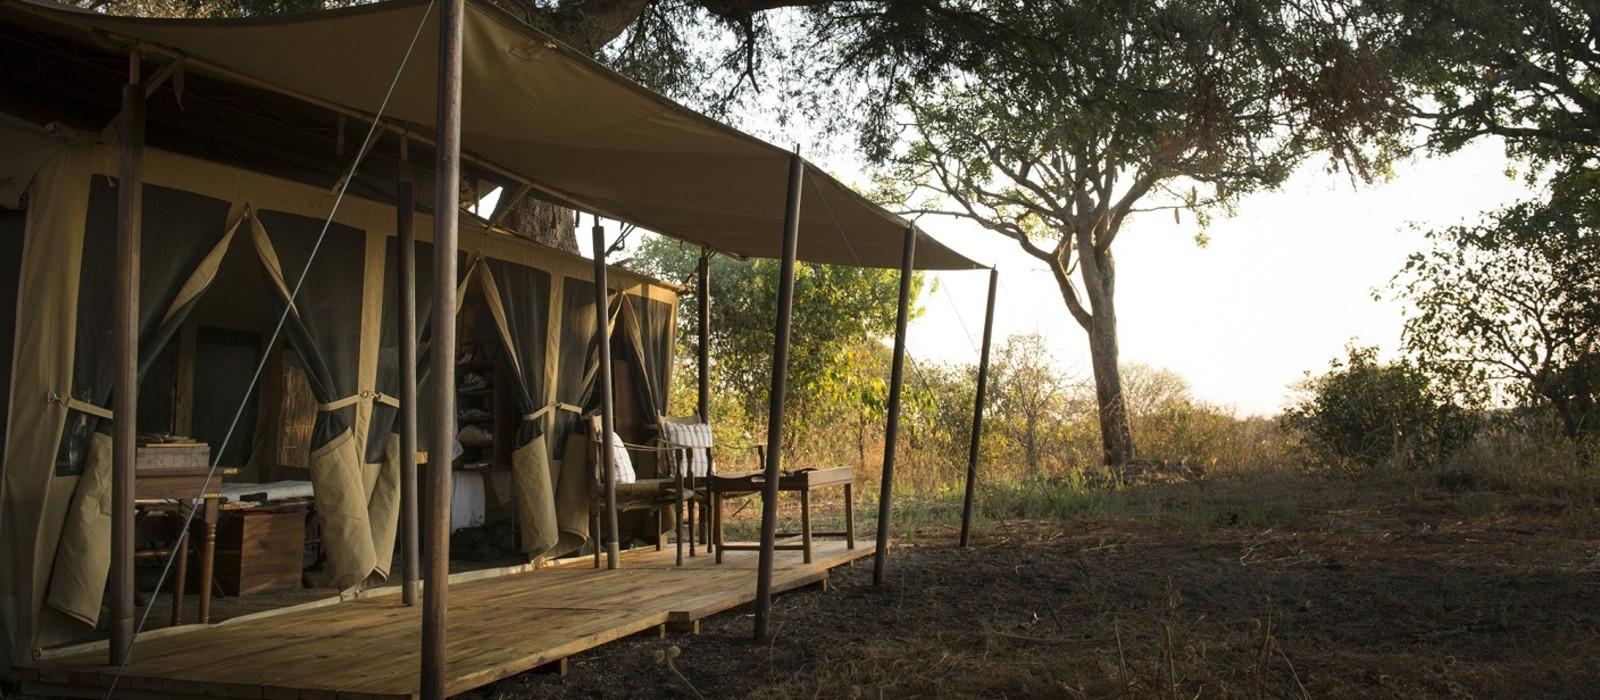 Hotel Chada Katavi Camp Tanzania